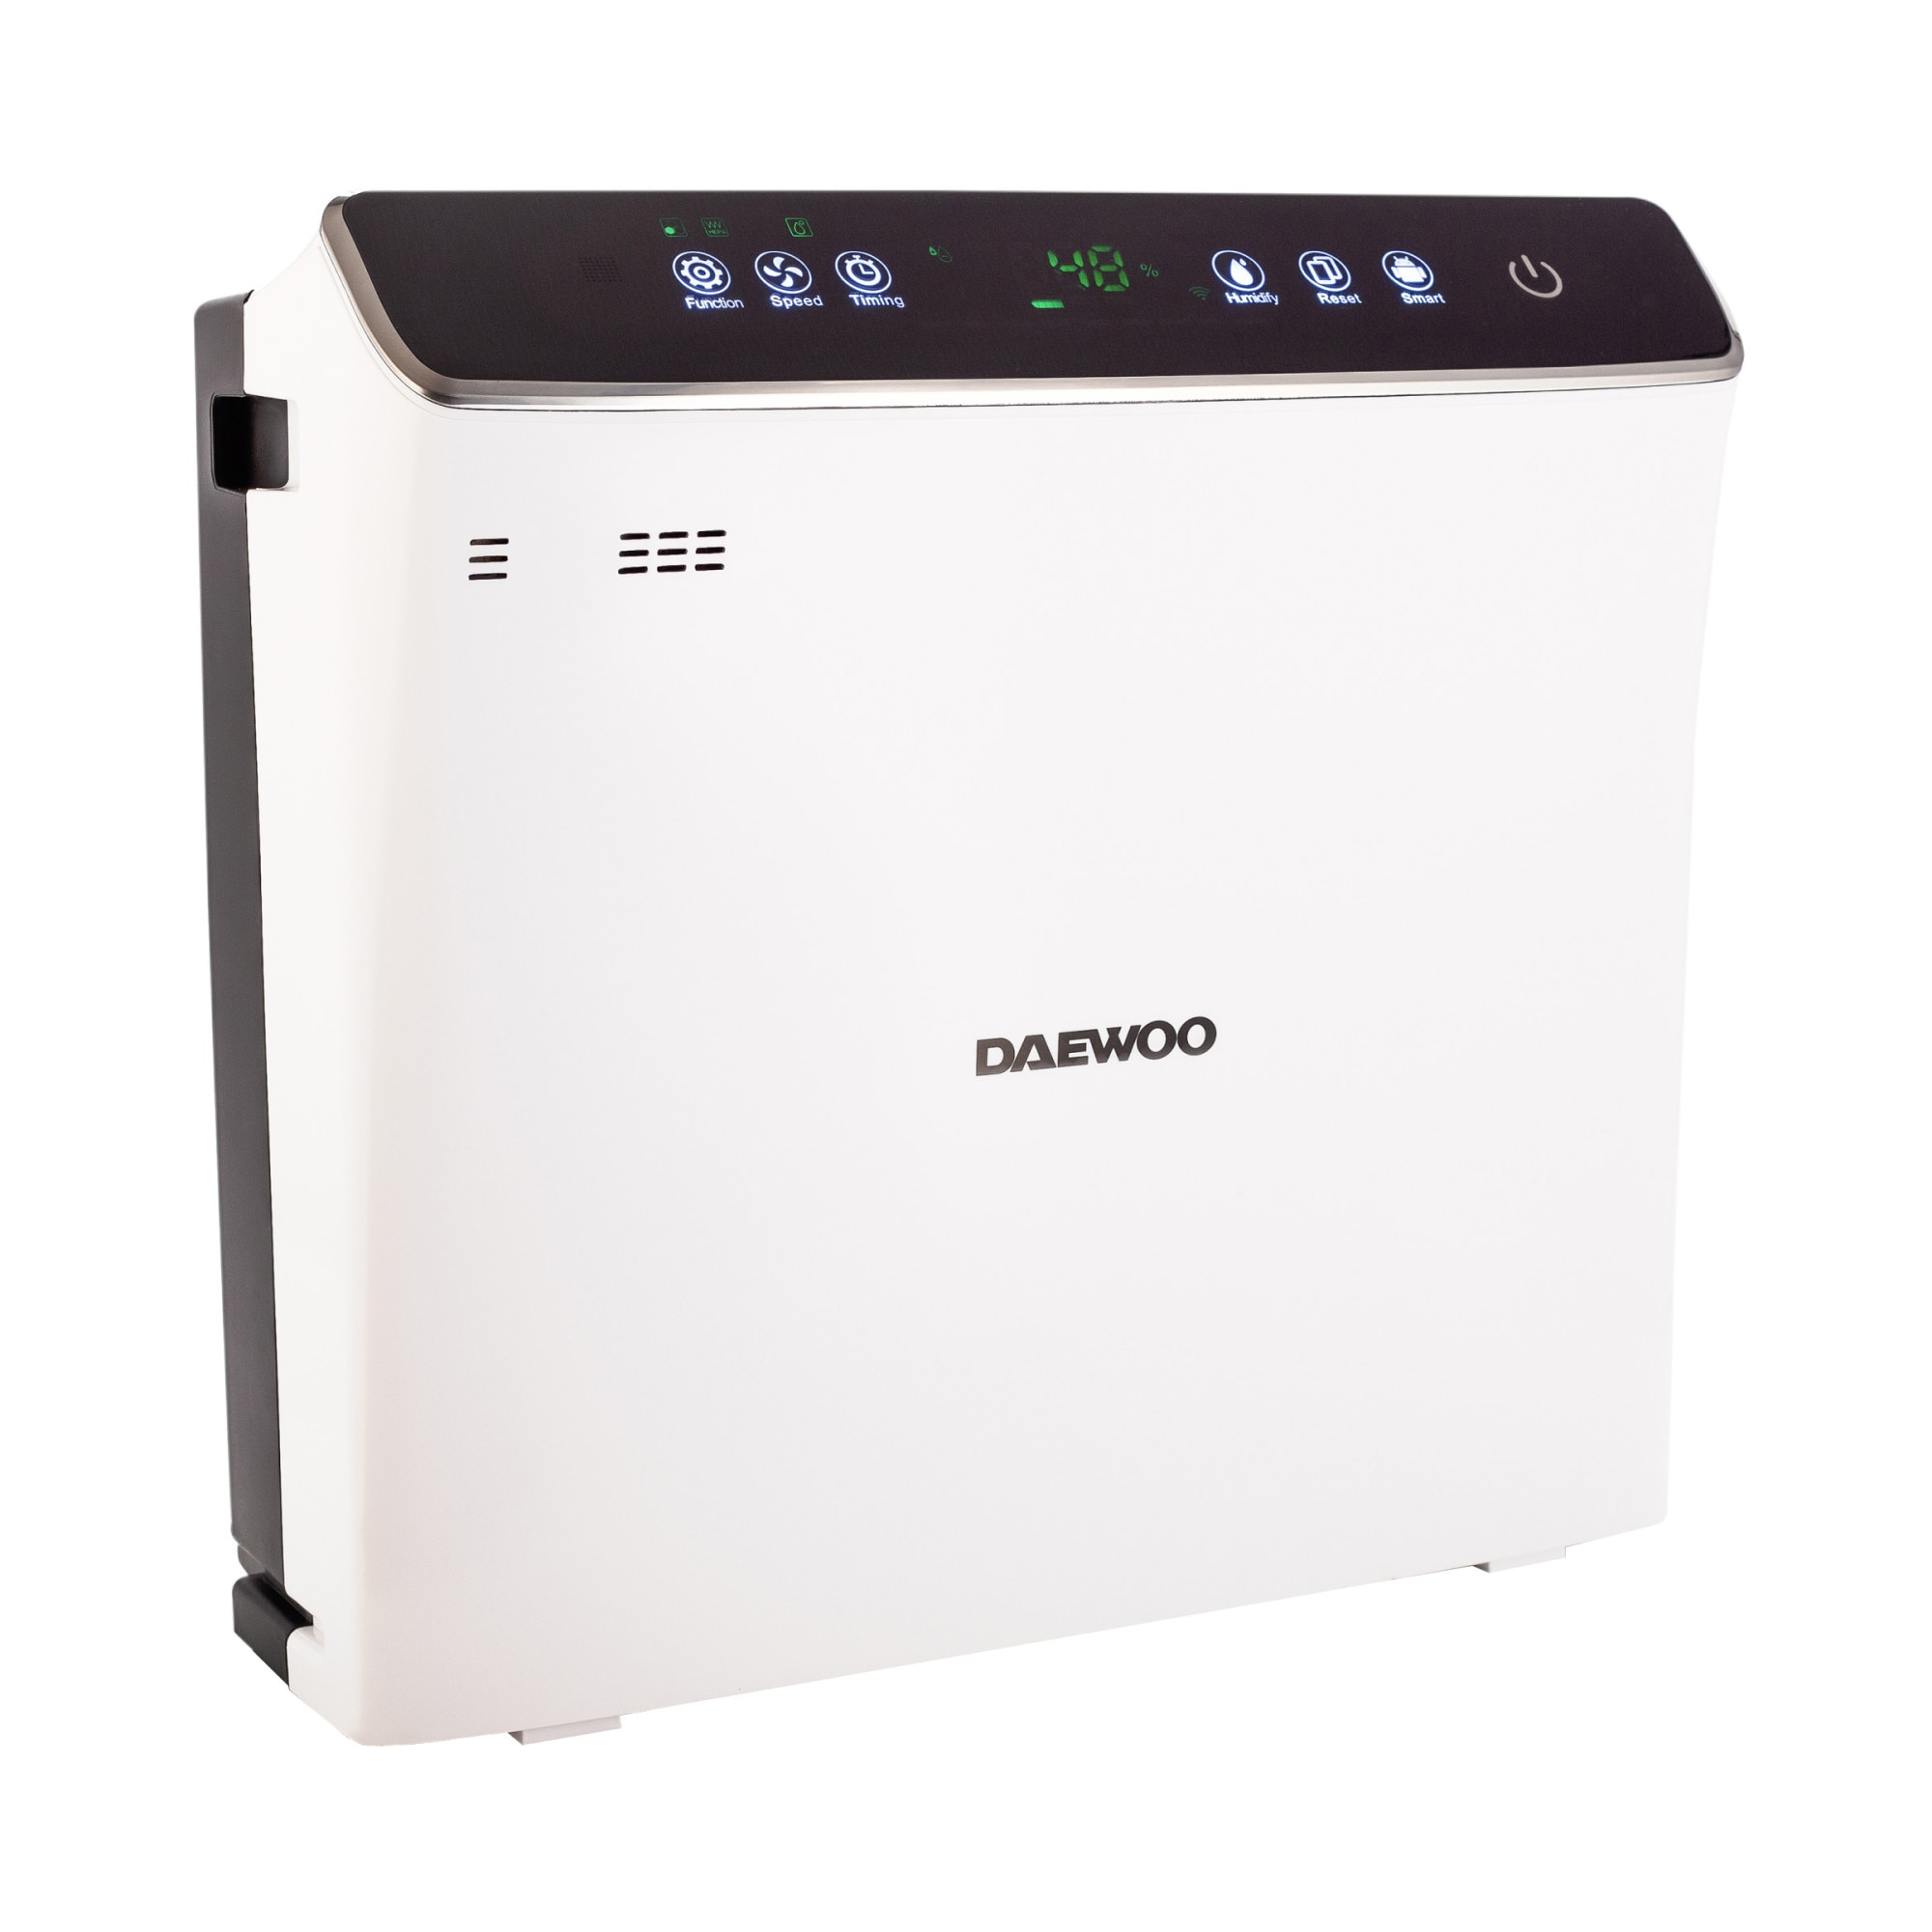 Fotografie Purificator de aer si umidificator Daewoo DAP400 Wi-Fi, 75 W, 300 m3/h, filtru HEPA13, carbon activ, foto catalizator, lampa UV, rezervor apa 2.5 l, senzor inteligent, panou de comanda IMD, Anion, alarma automata, 45 dB